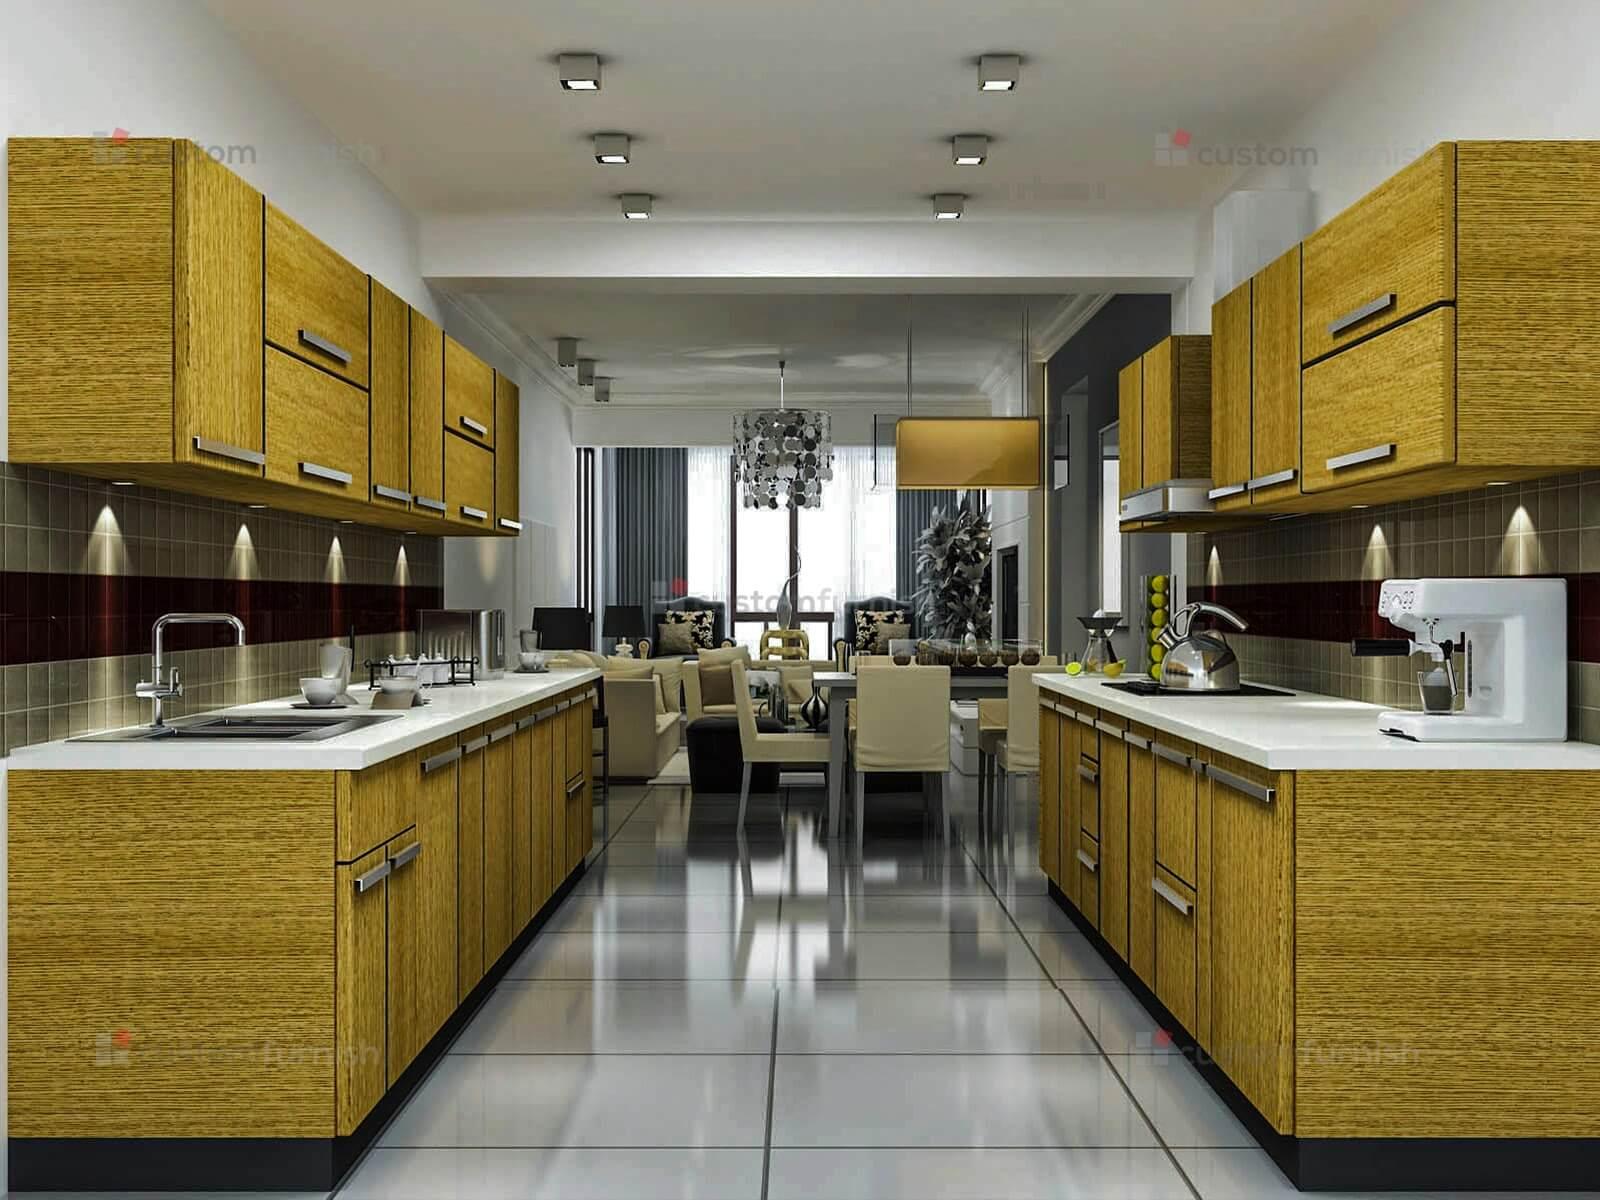 parallel kitchen dyhome. Black Bedroom Furniture Sets. Home Design Ideas